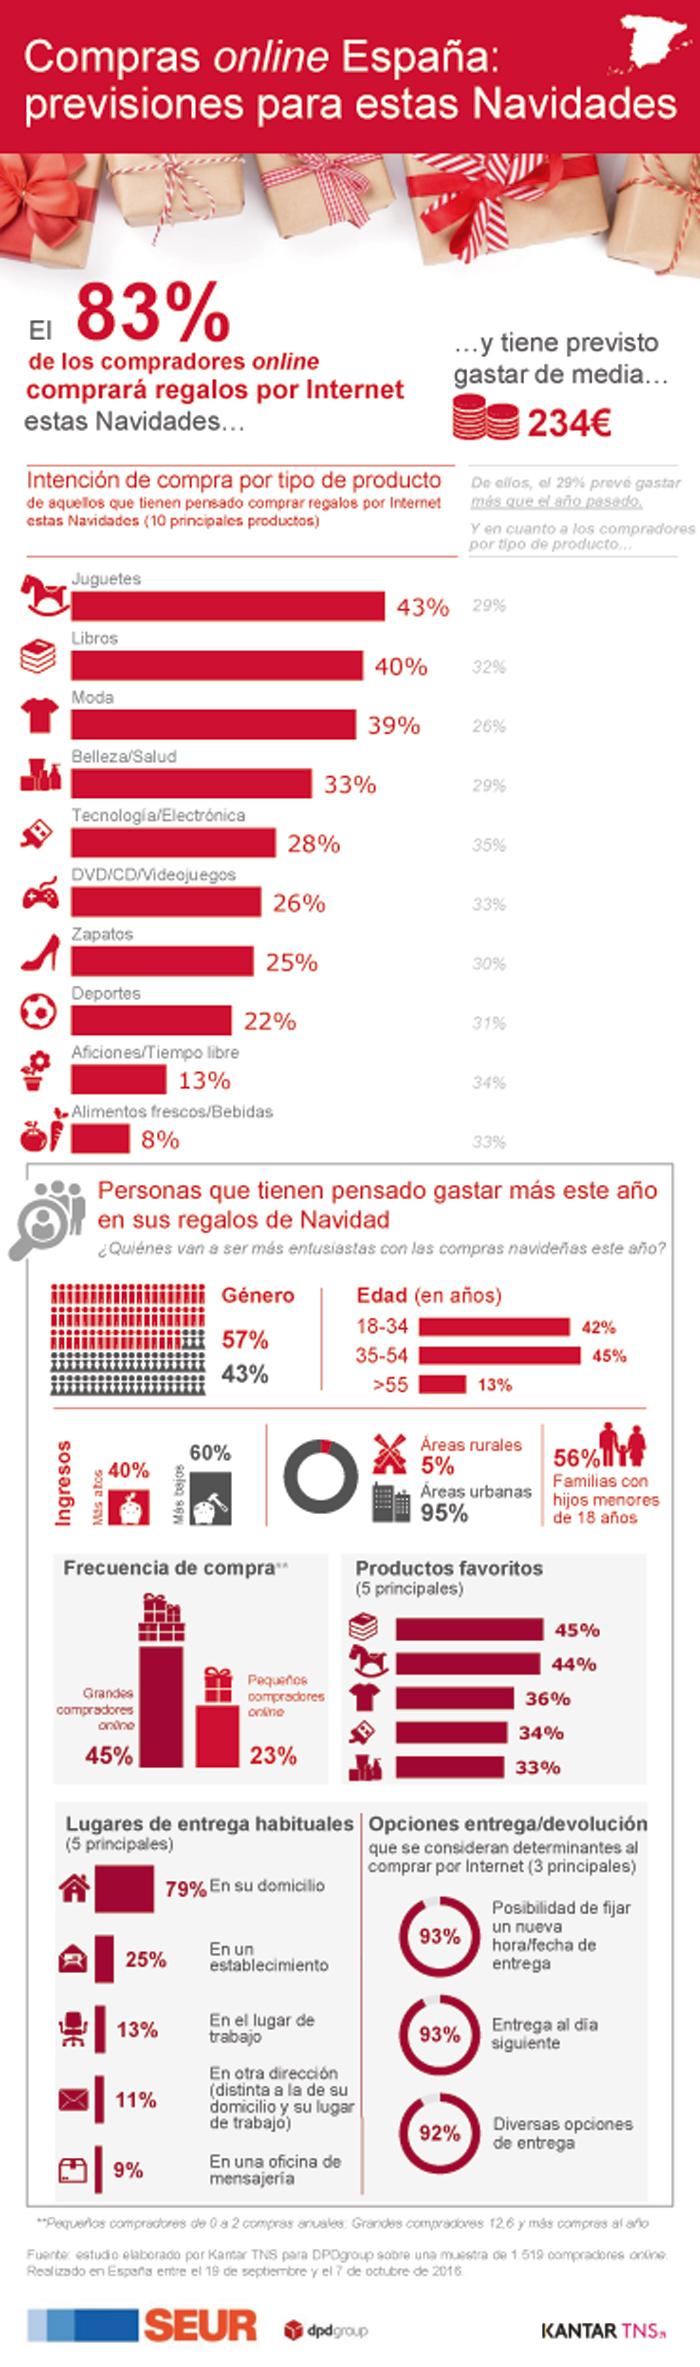 spain_infographics_es-def